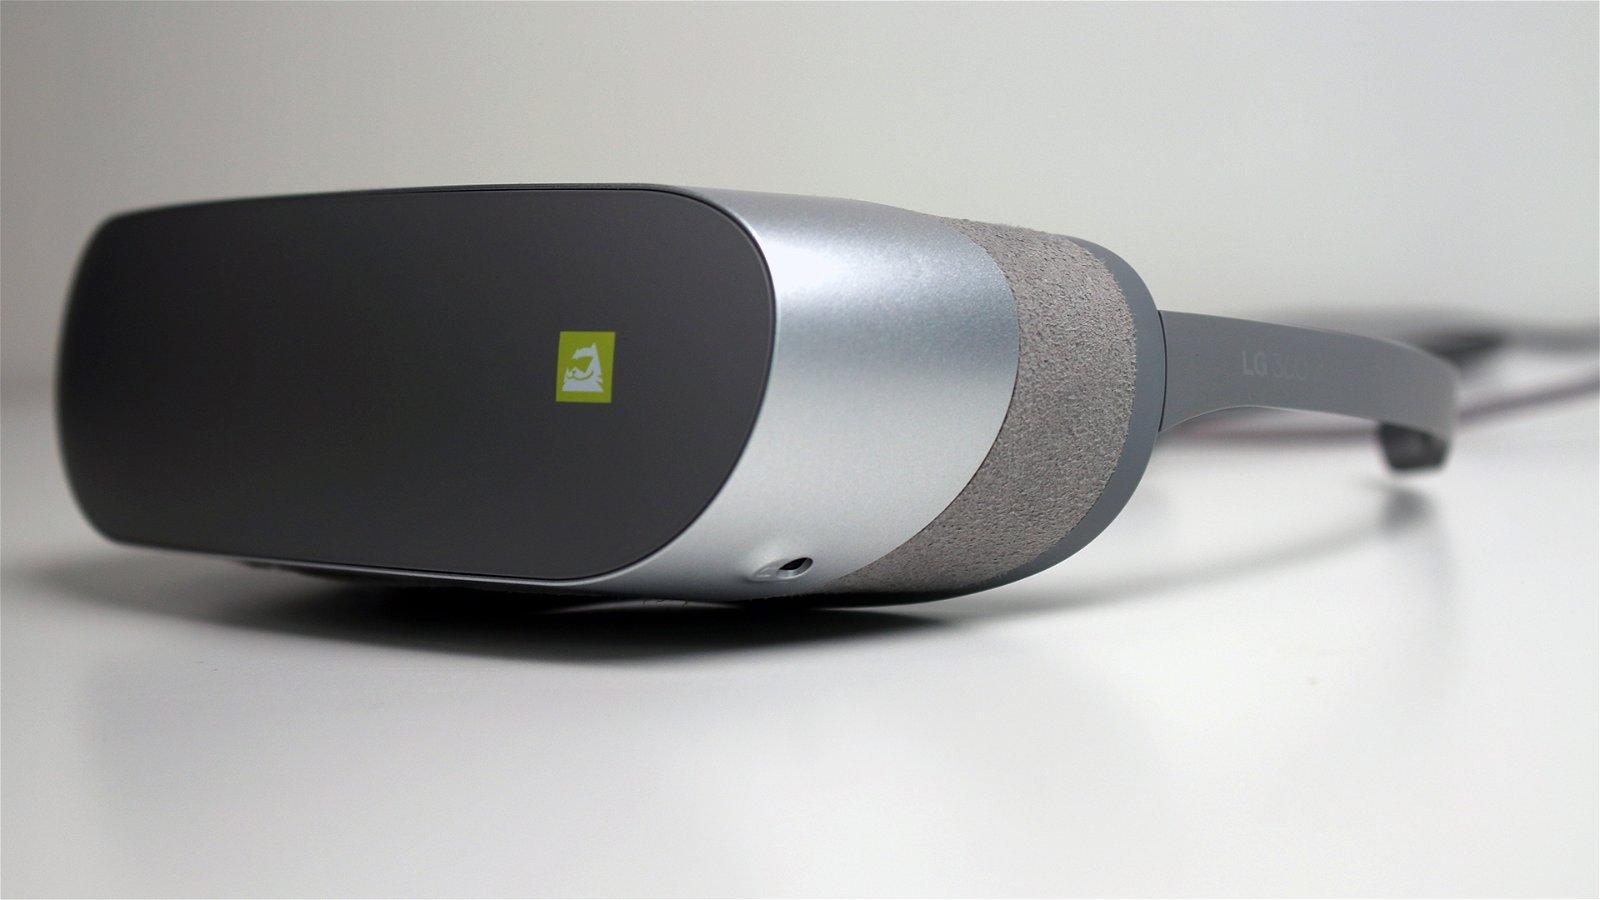 LG 360 VR (VR Headset) Review 4